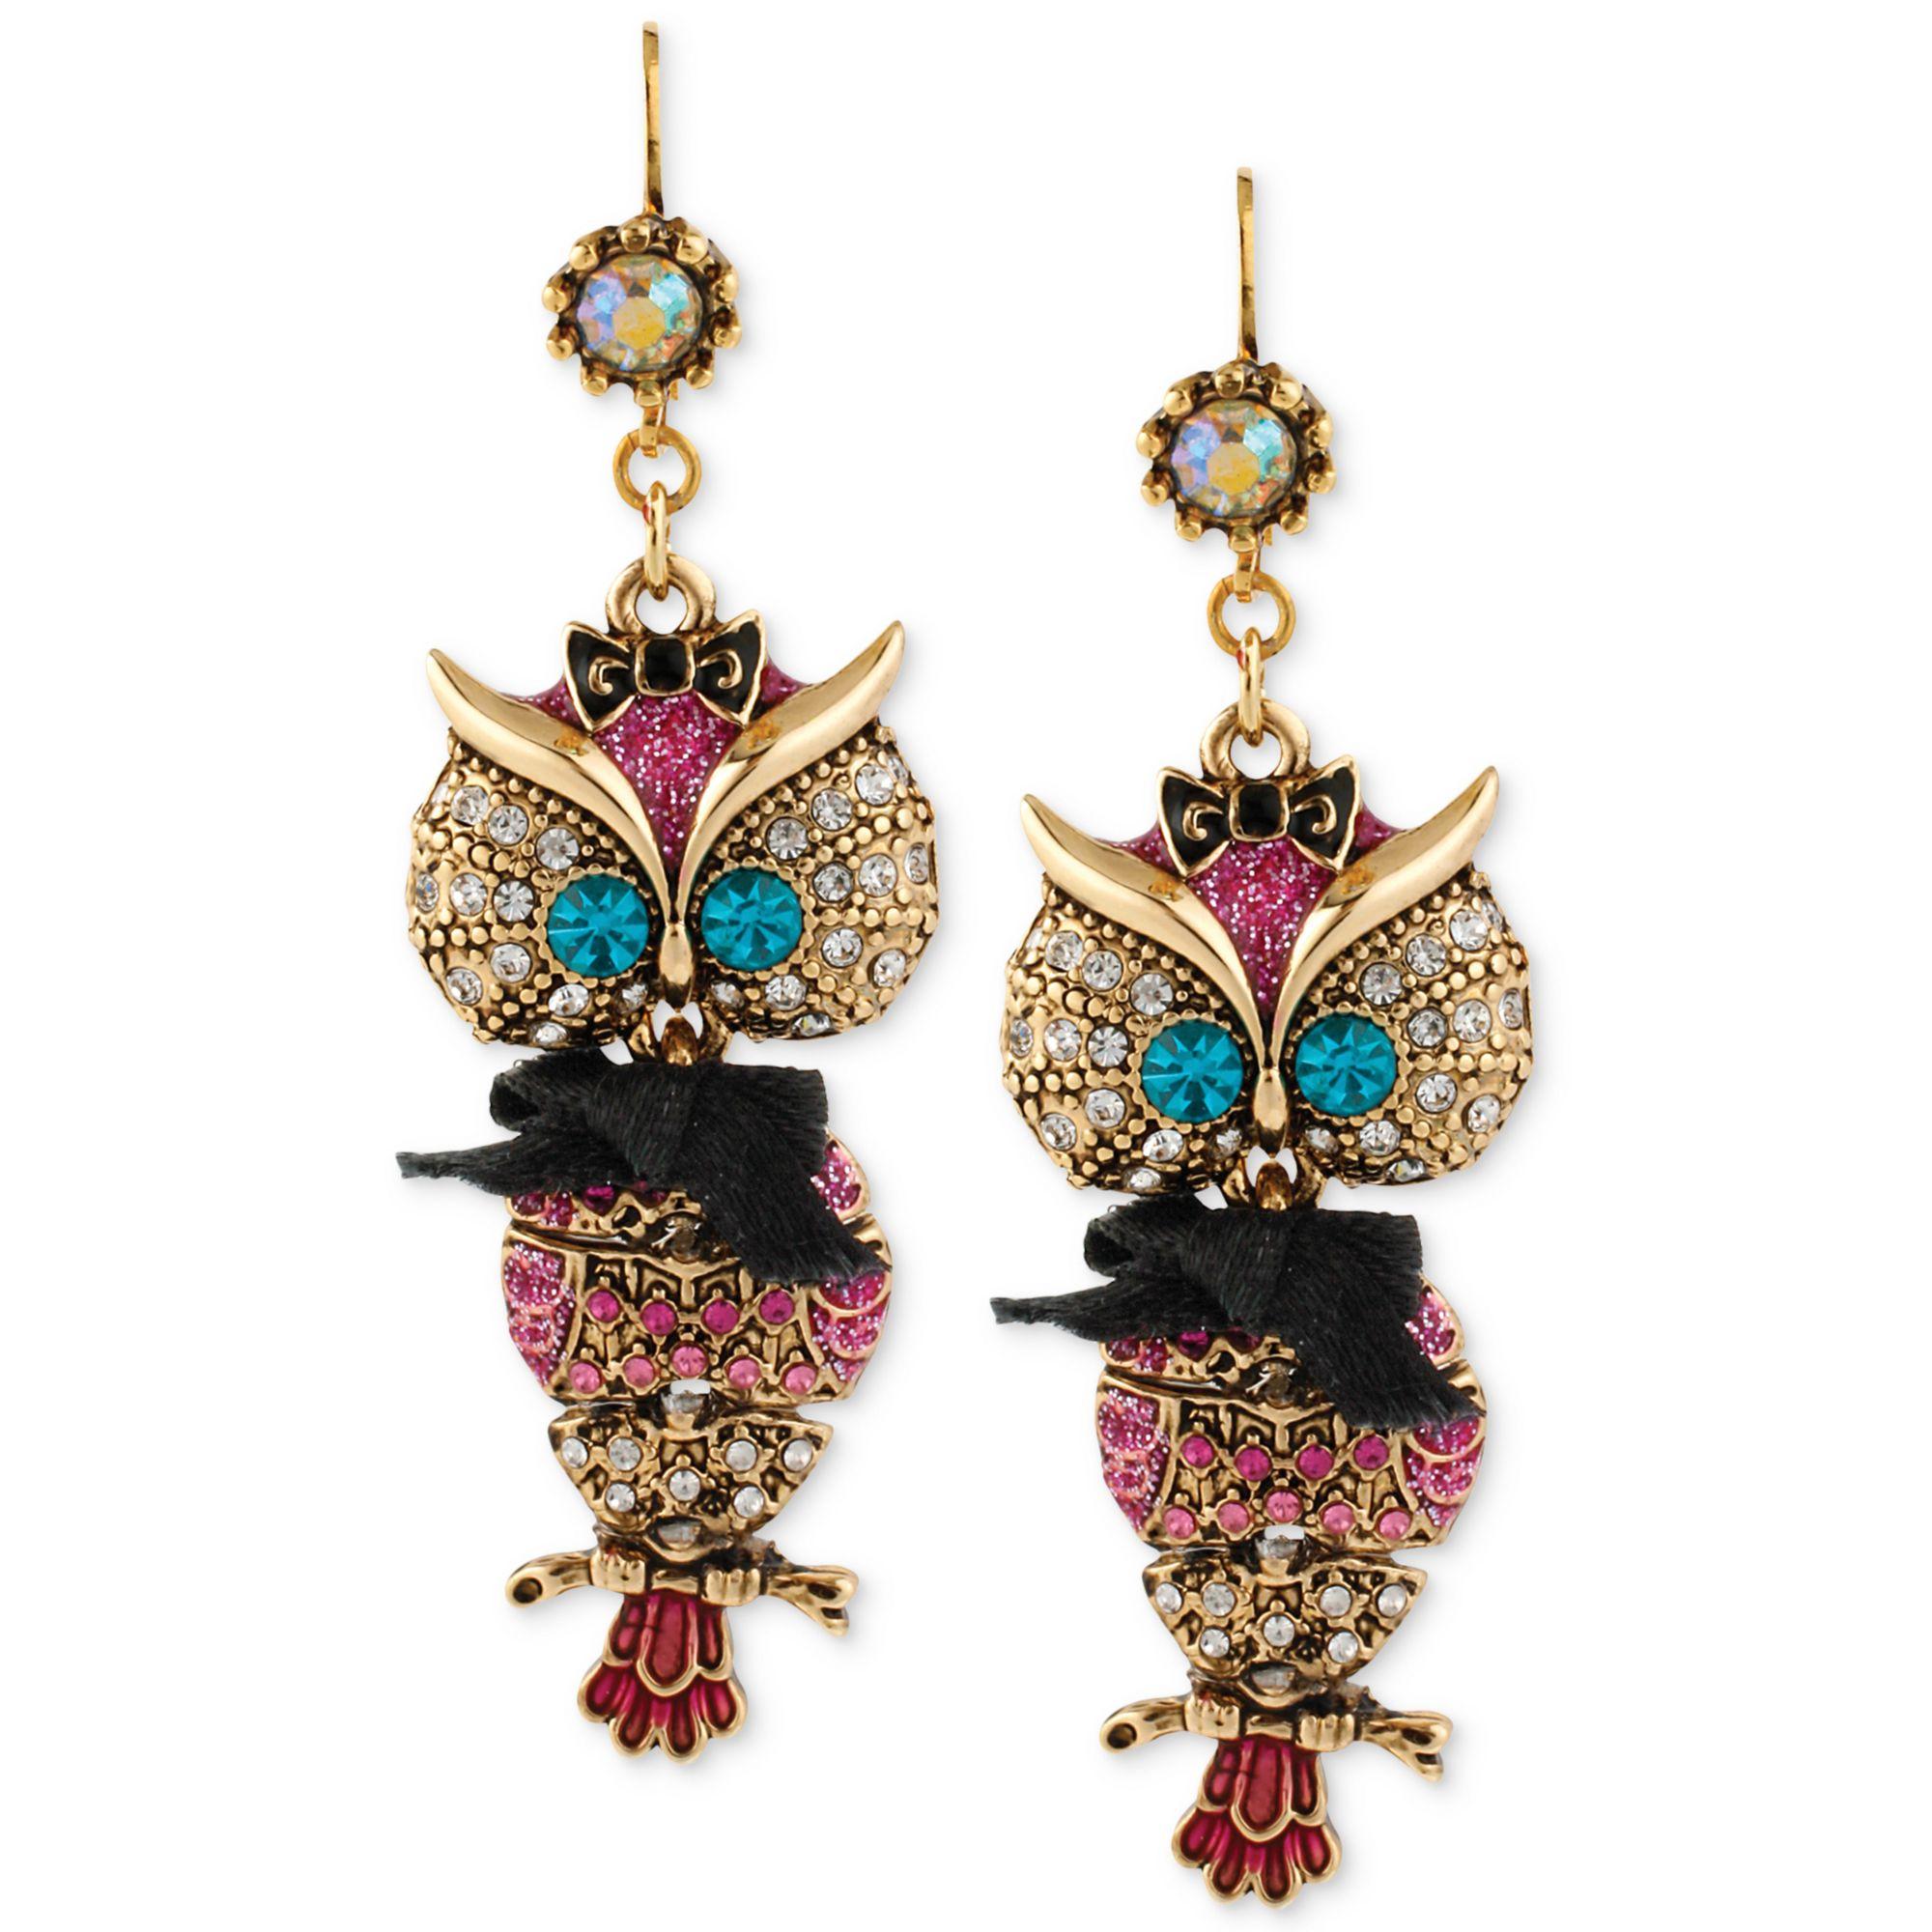 6667e9c32d0db Betsey Johnson Metallic Antique Goldtone Owl Drop Earrings